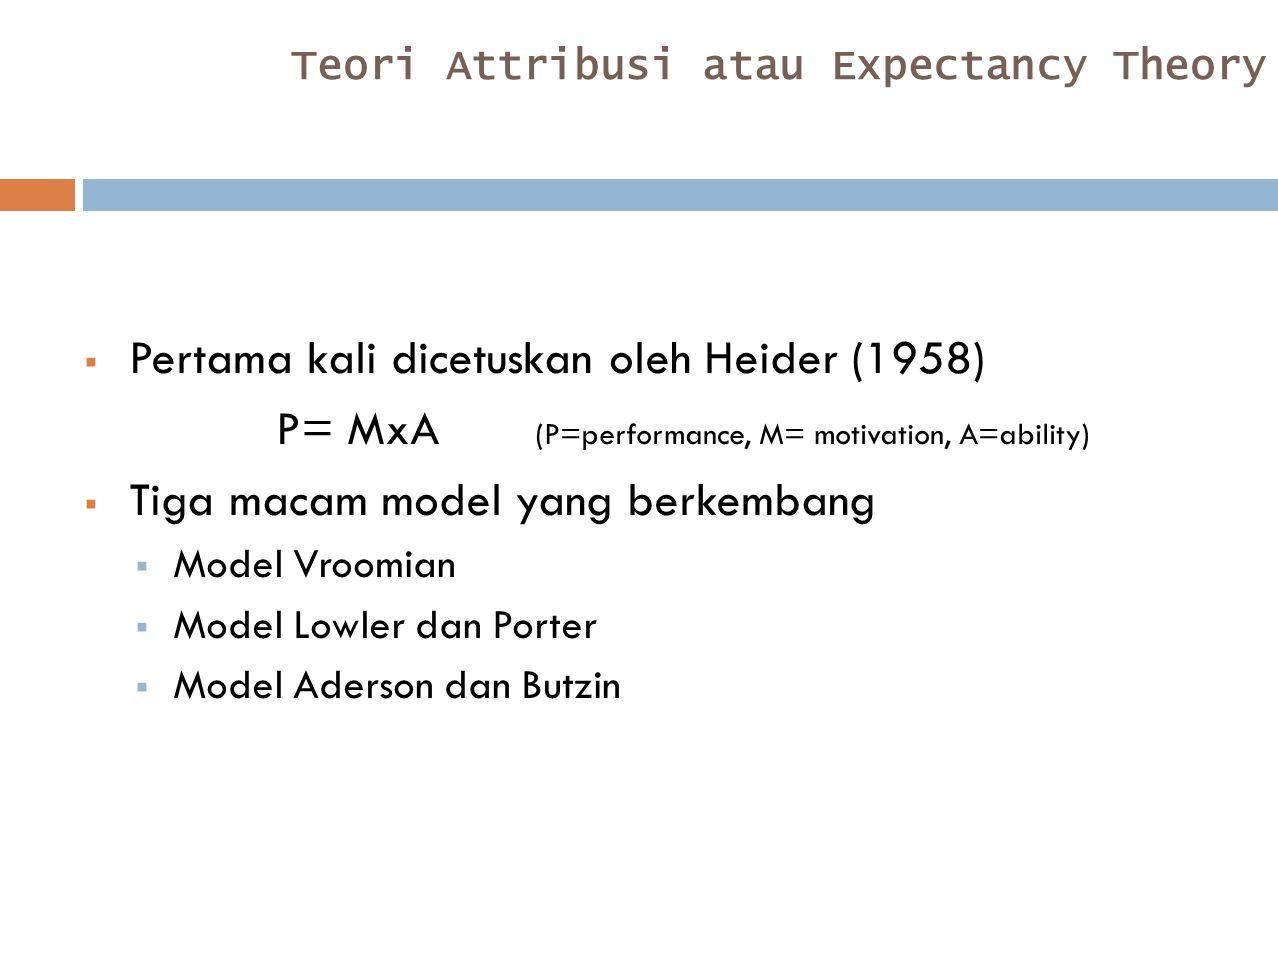 Teori Attribusi atau Expectancy Theory